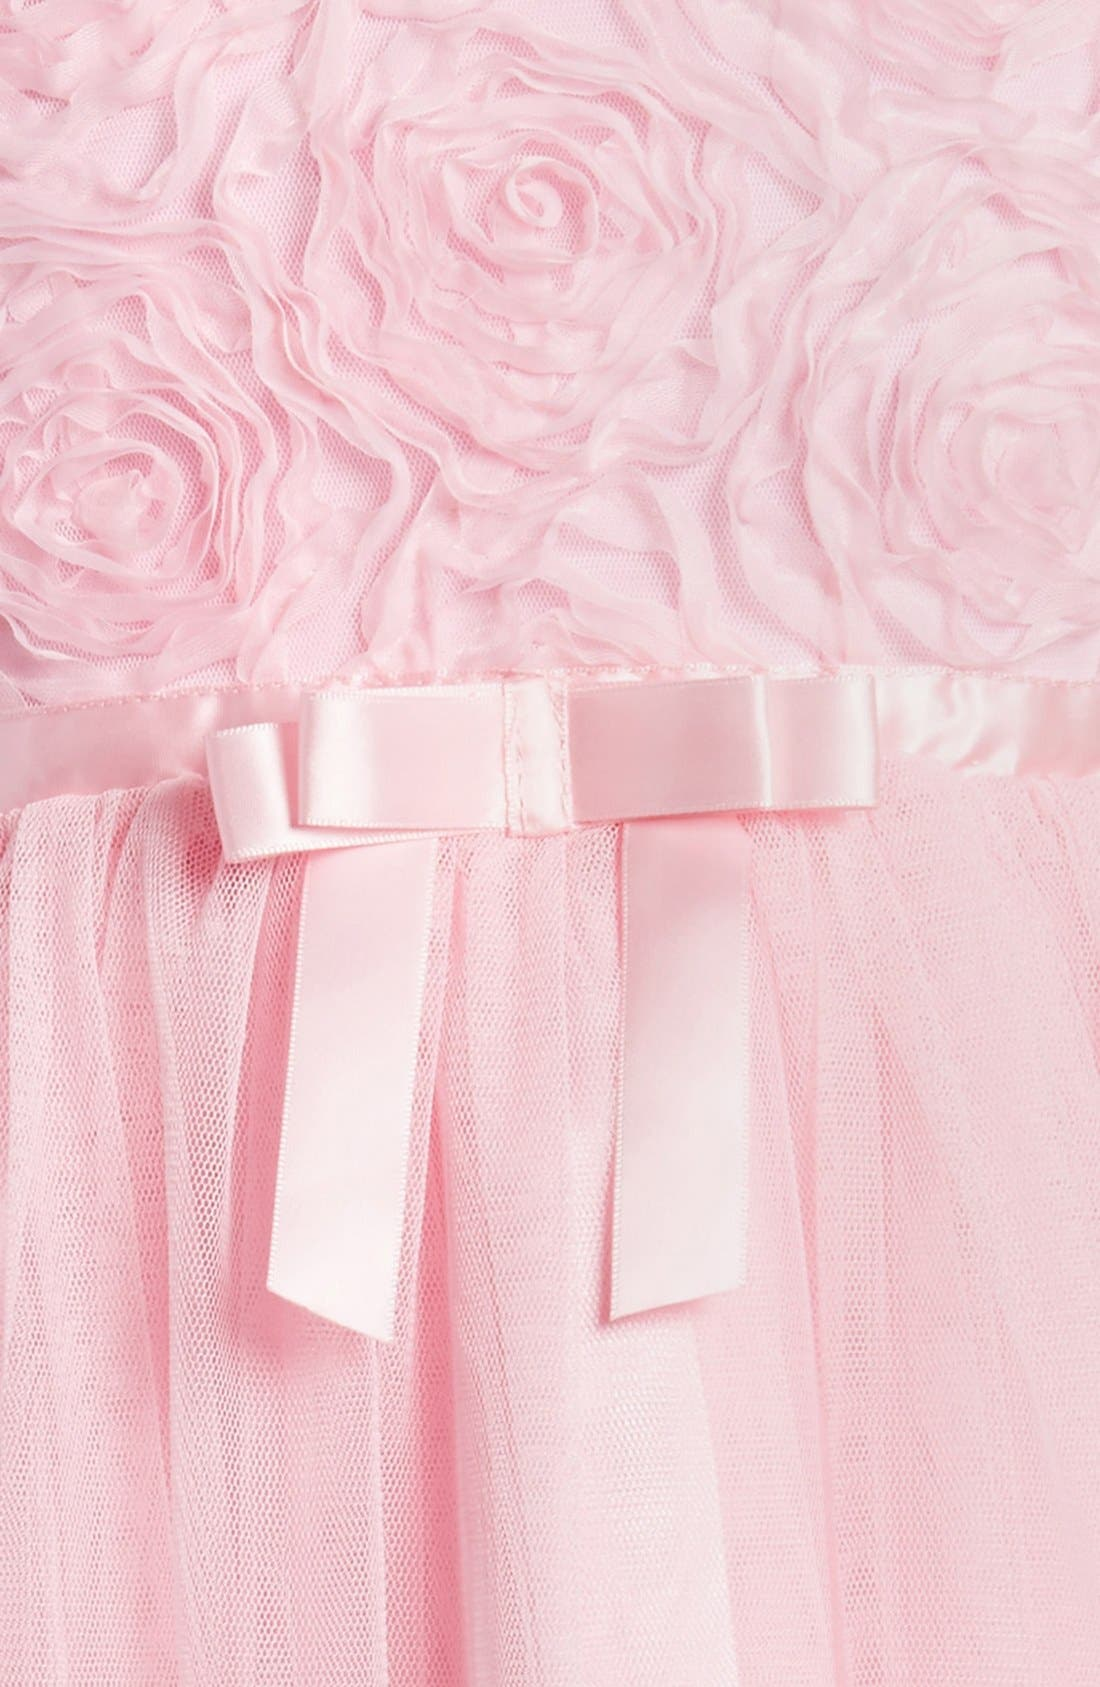 Ribbon Rosette Tulle Dress,                             Alternate thumbnail 3, color,                             PINK